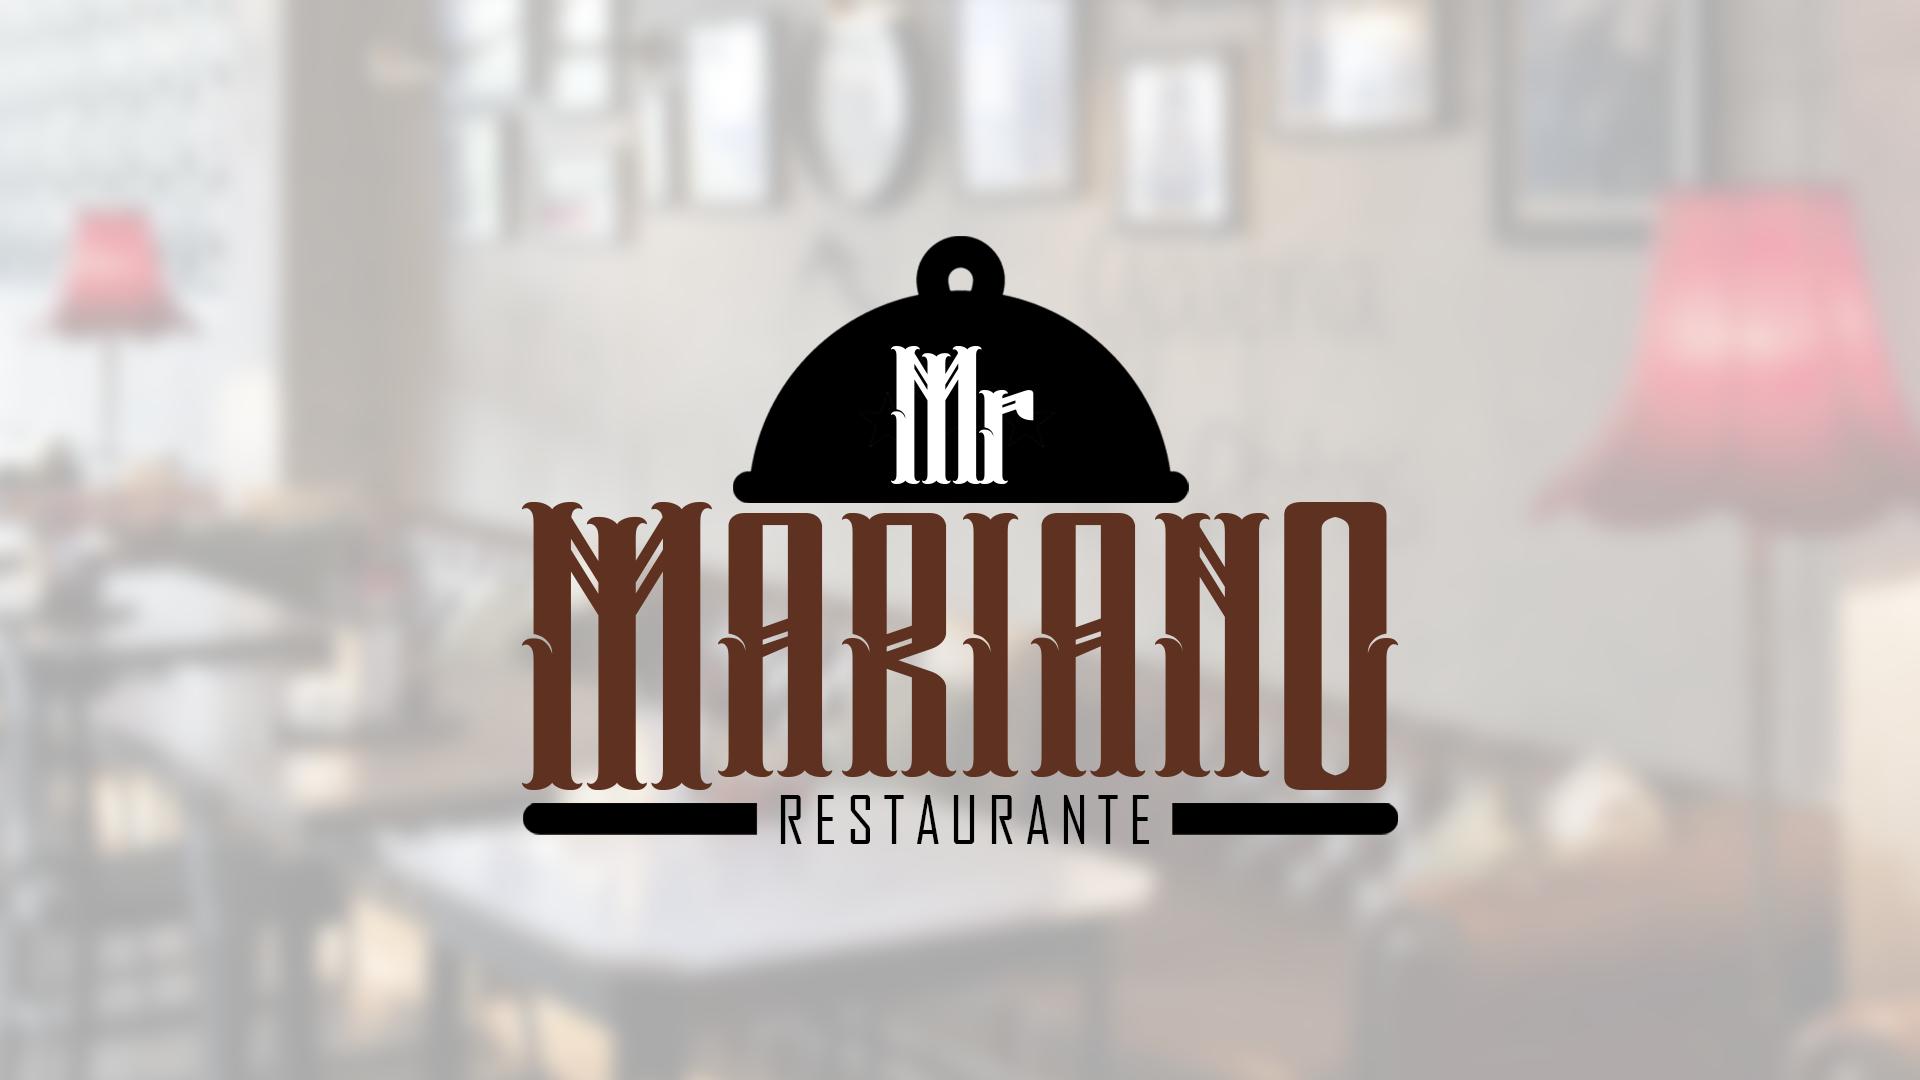 Mr Mariano